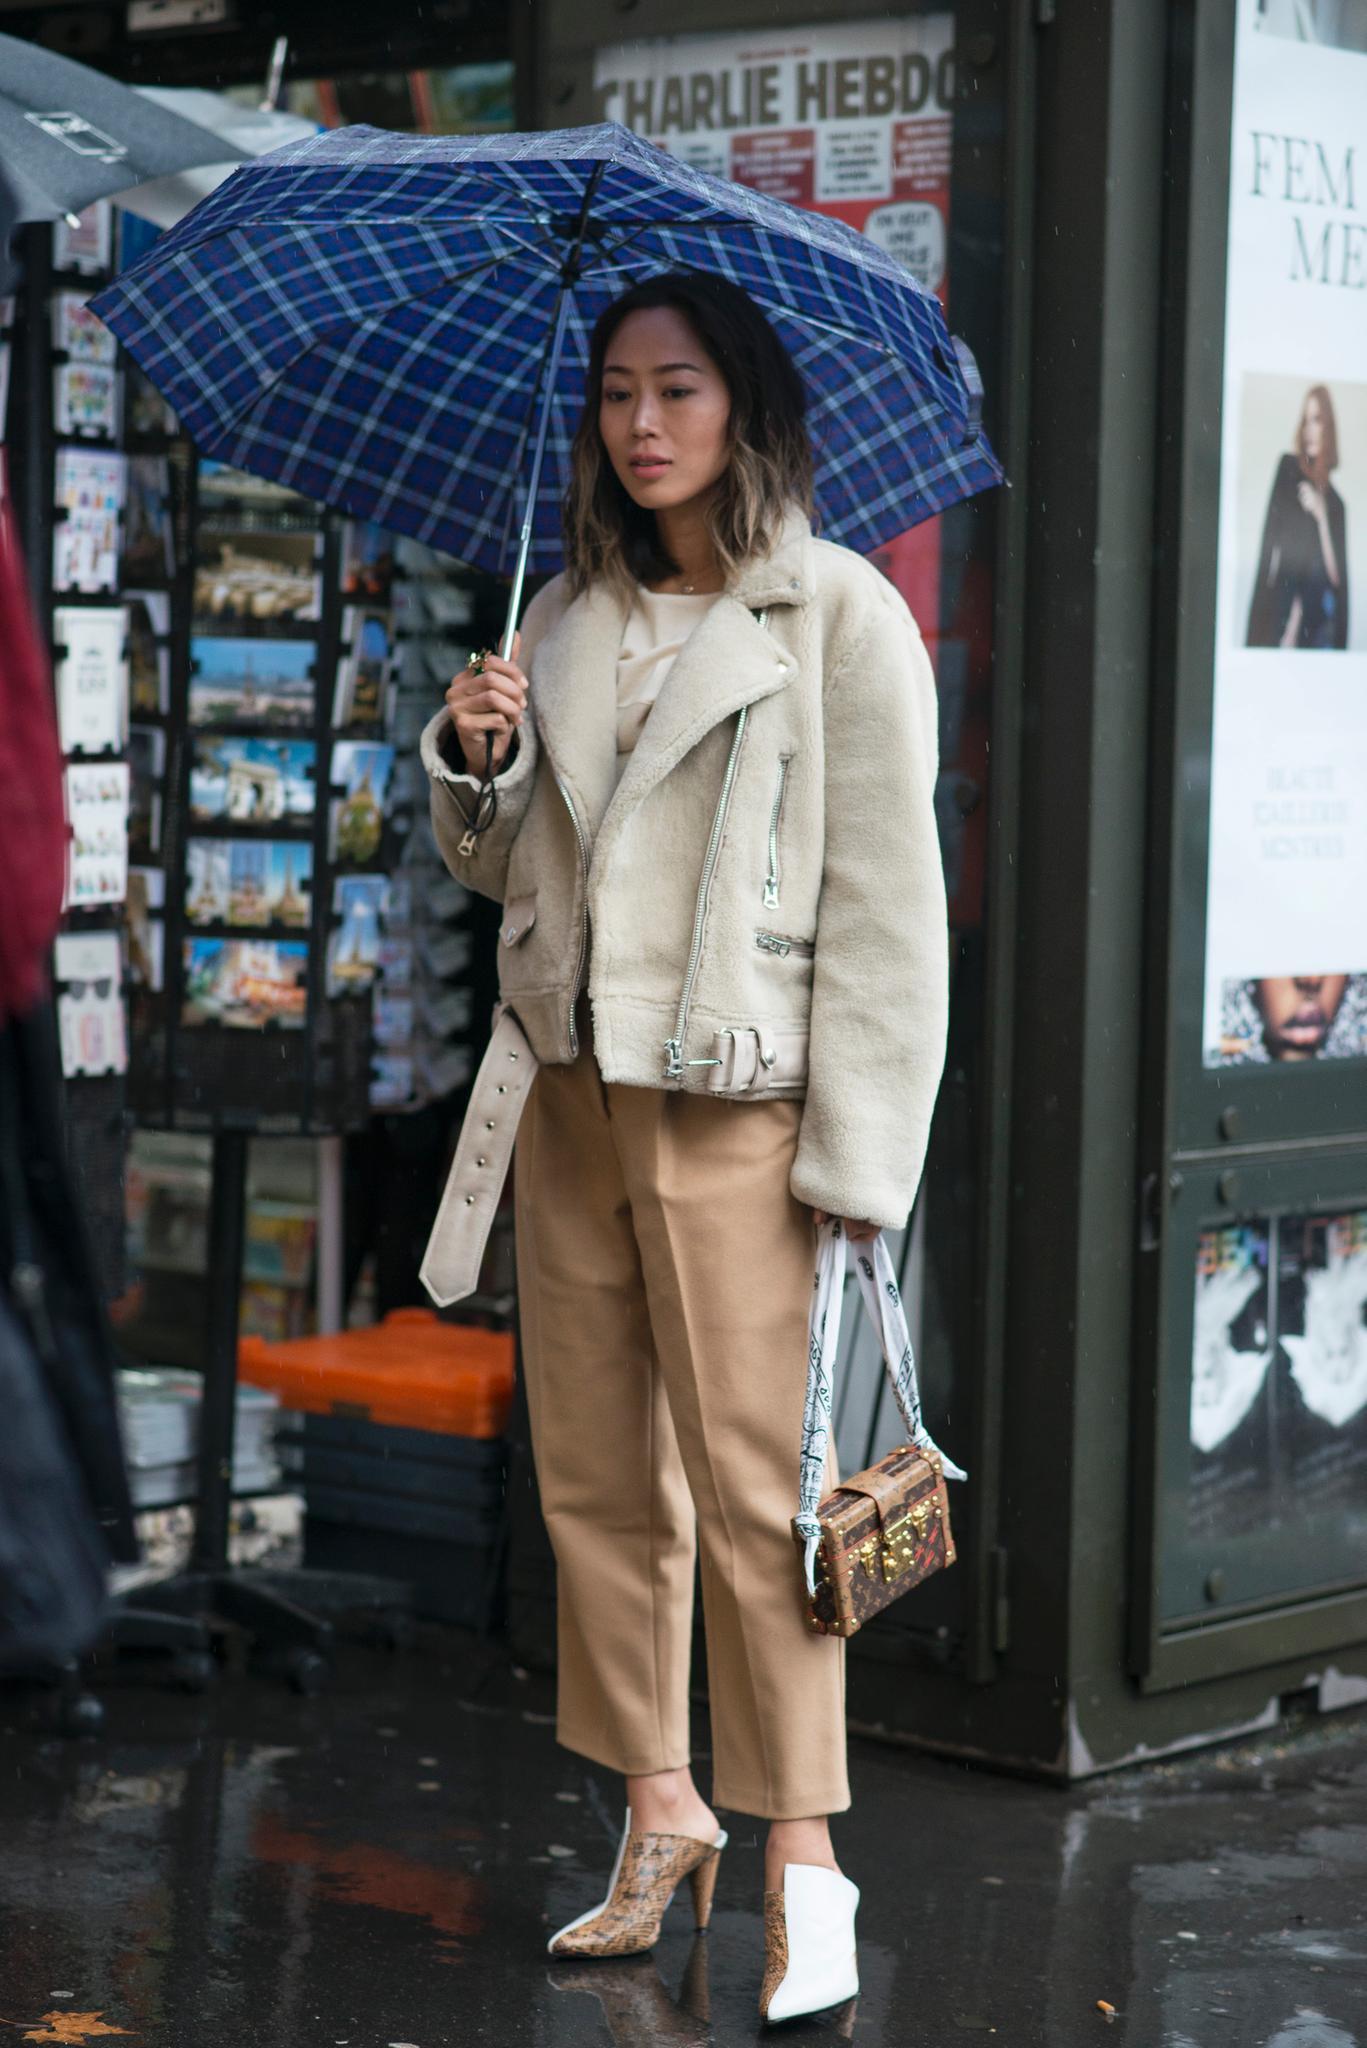 Regen-Outfit mit Lammfell-Bikerjacke und hohen Mules